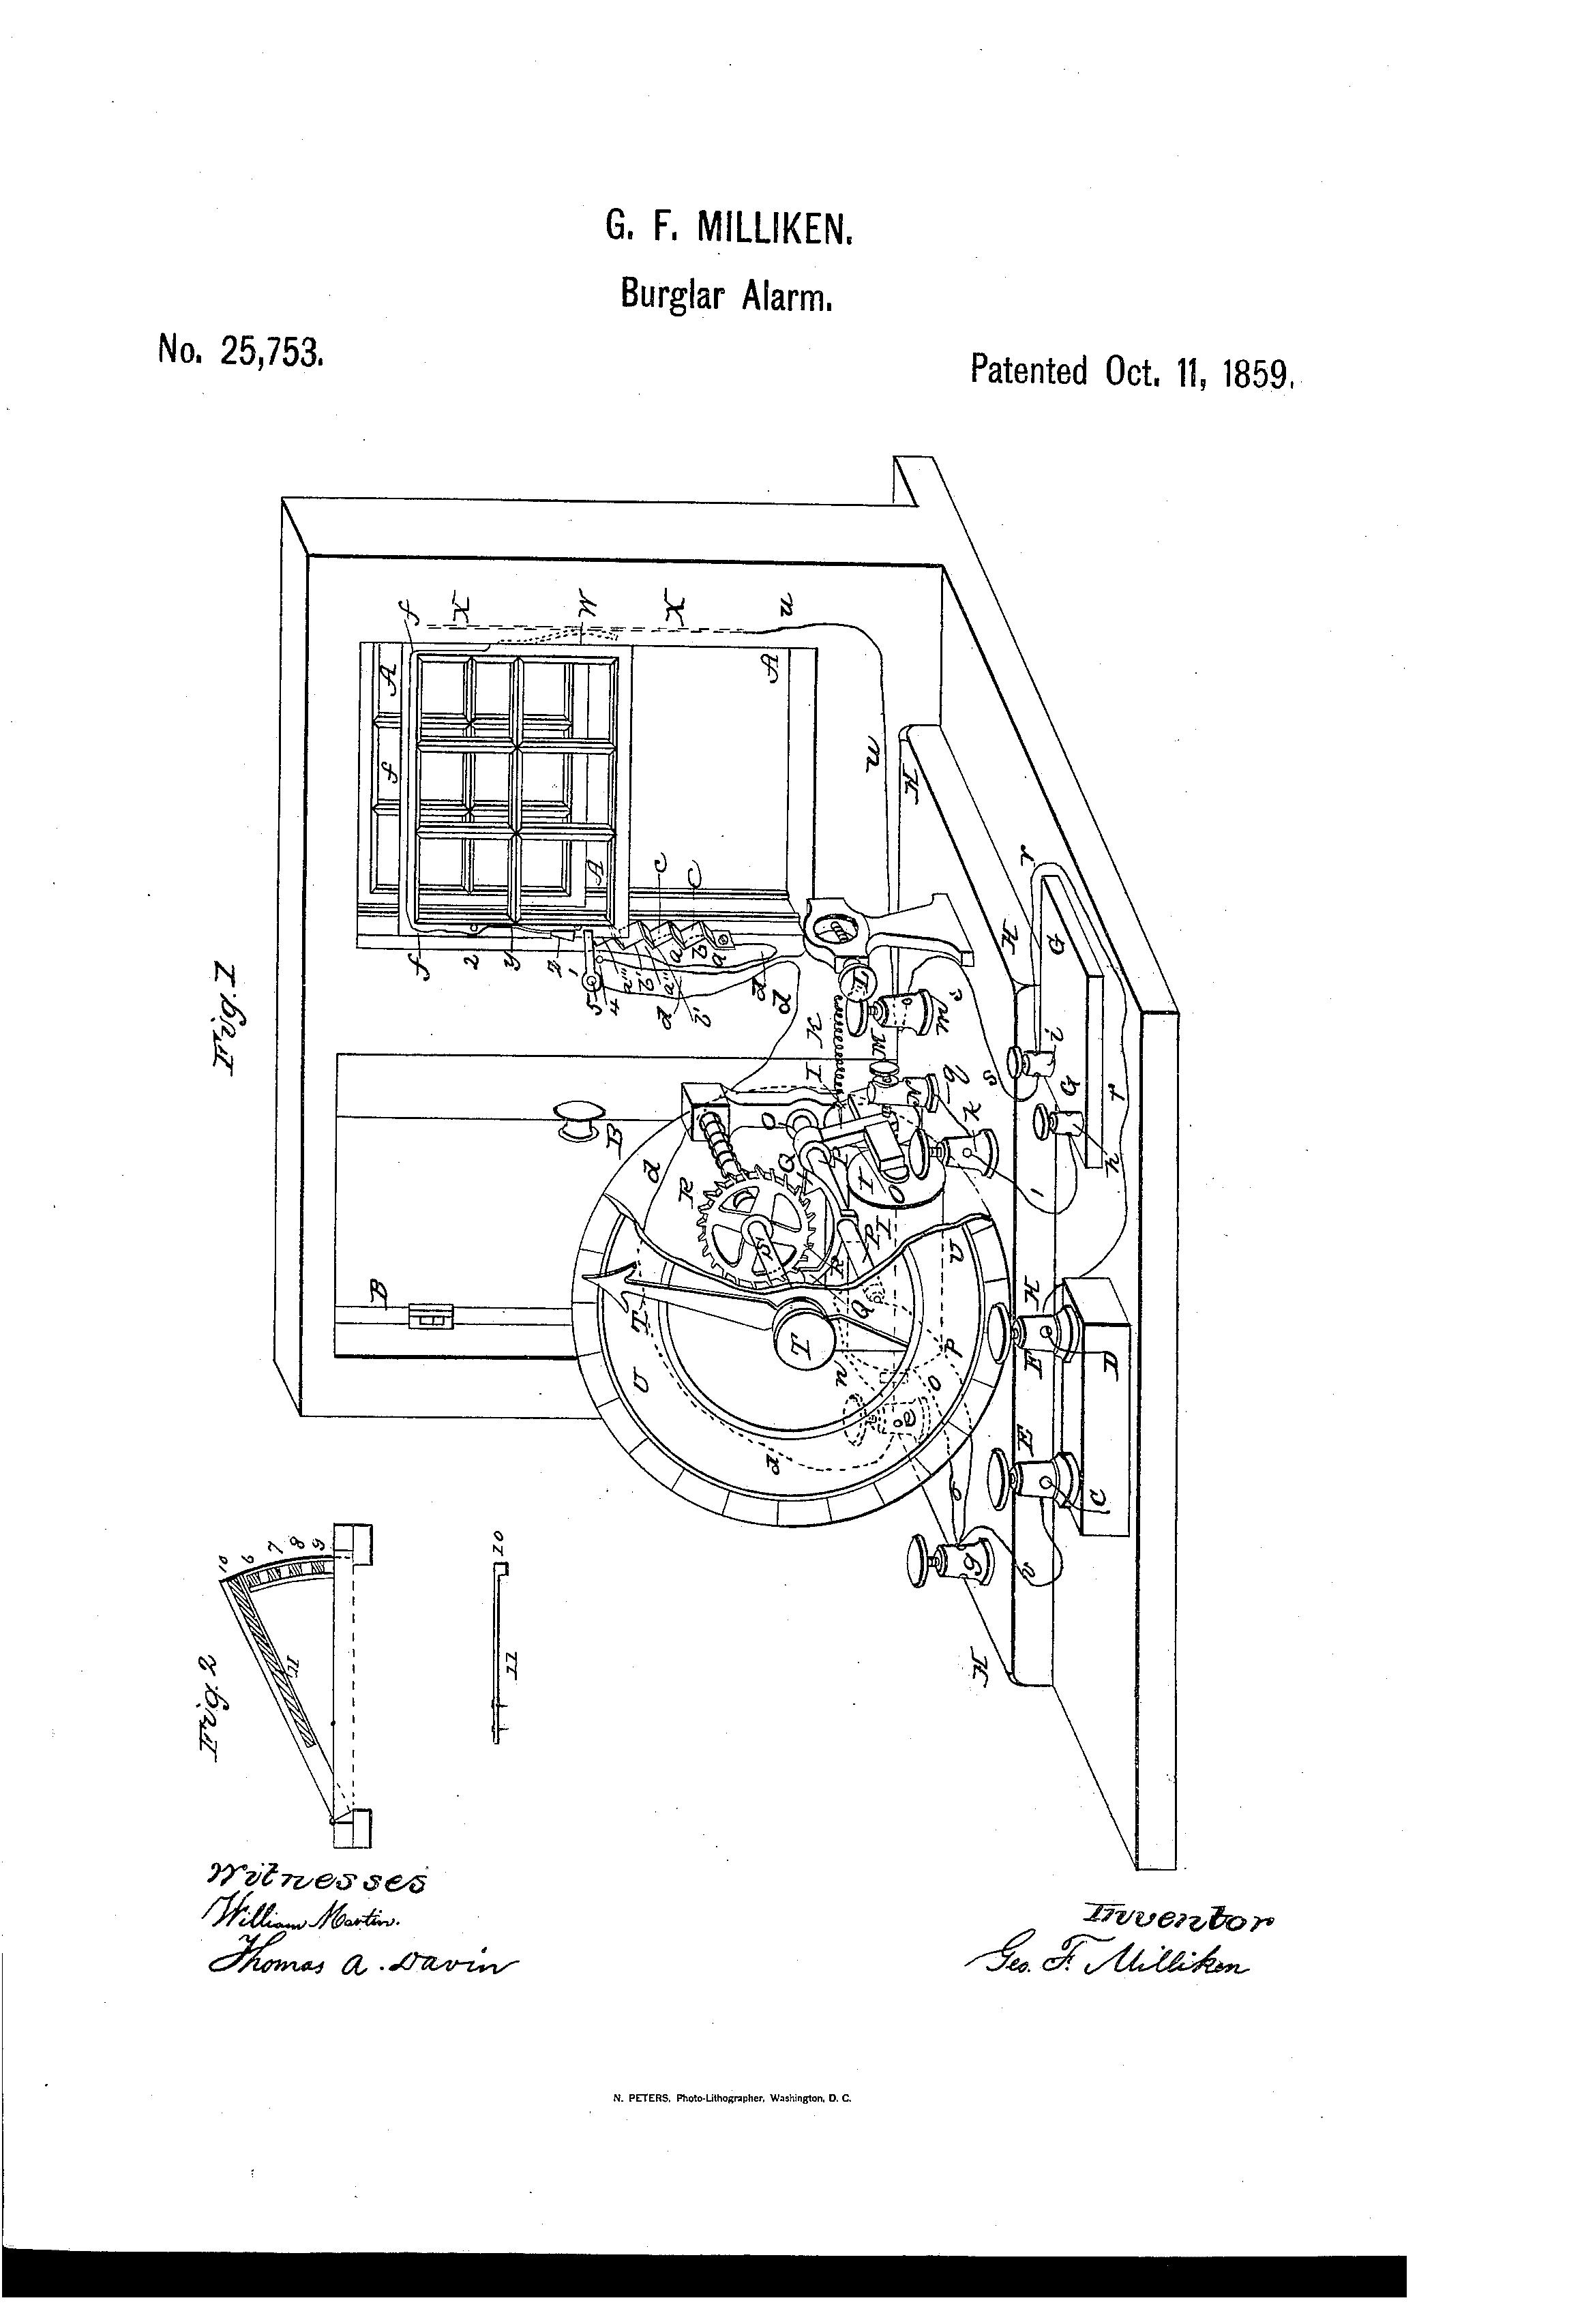 George F. Milliken Patent